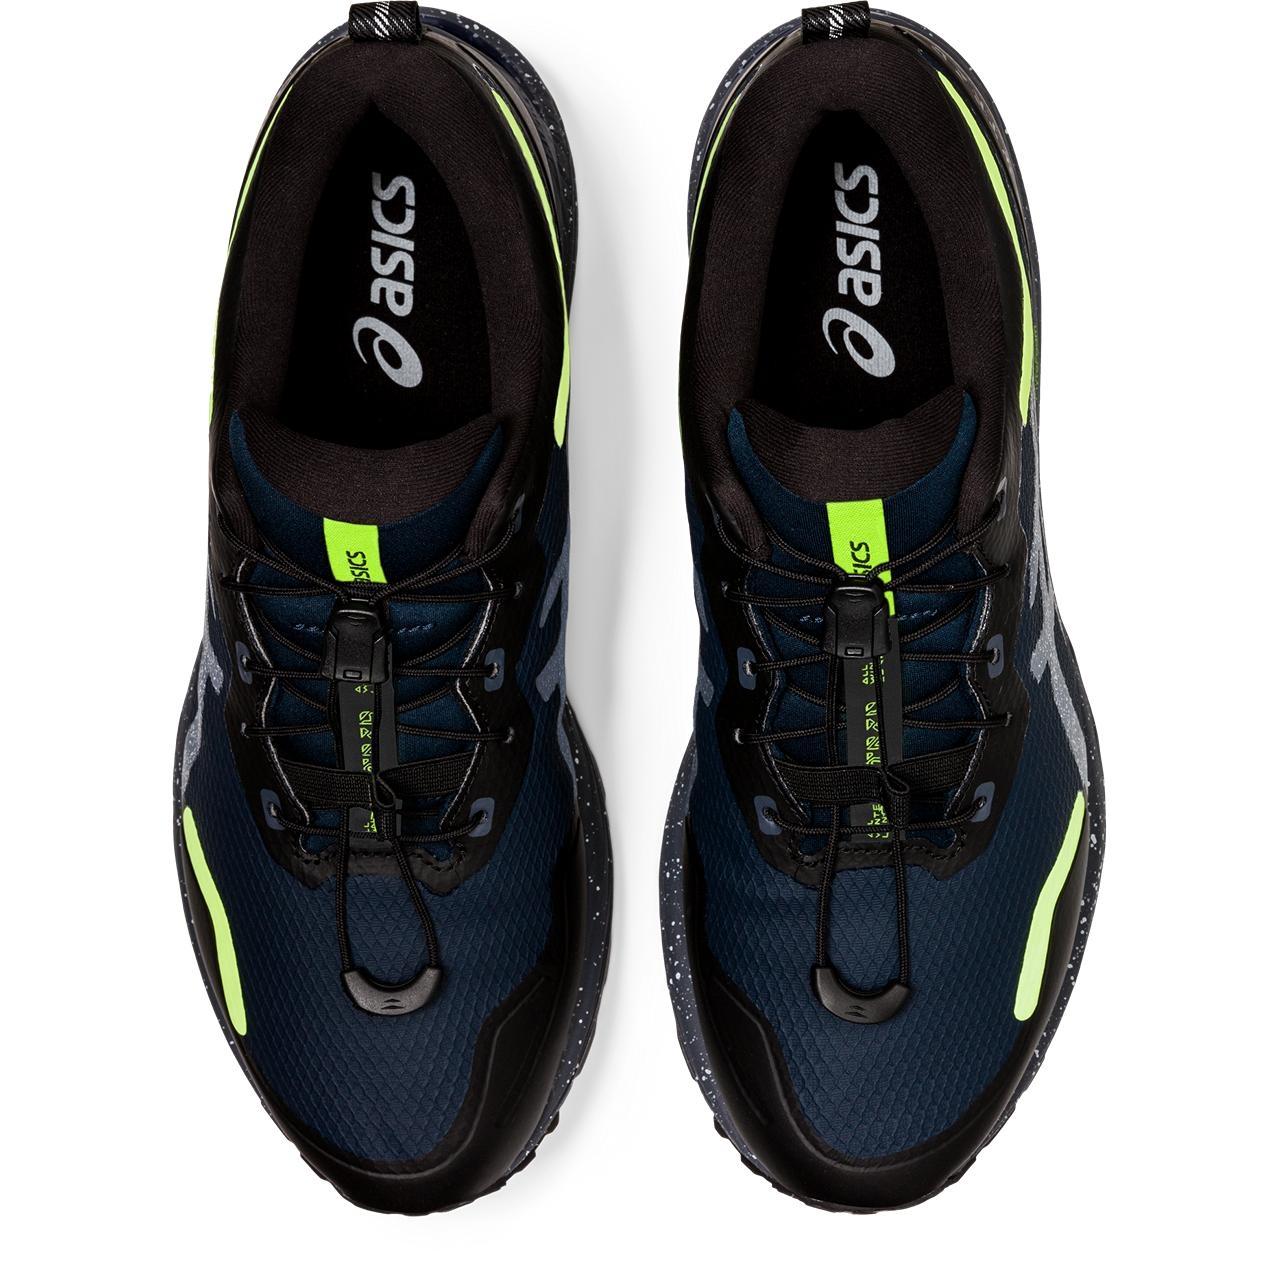 Image of asics GEL-Cumulus 23 AWL Running Shoe - french blue/safety yellow